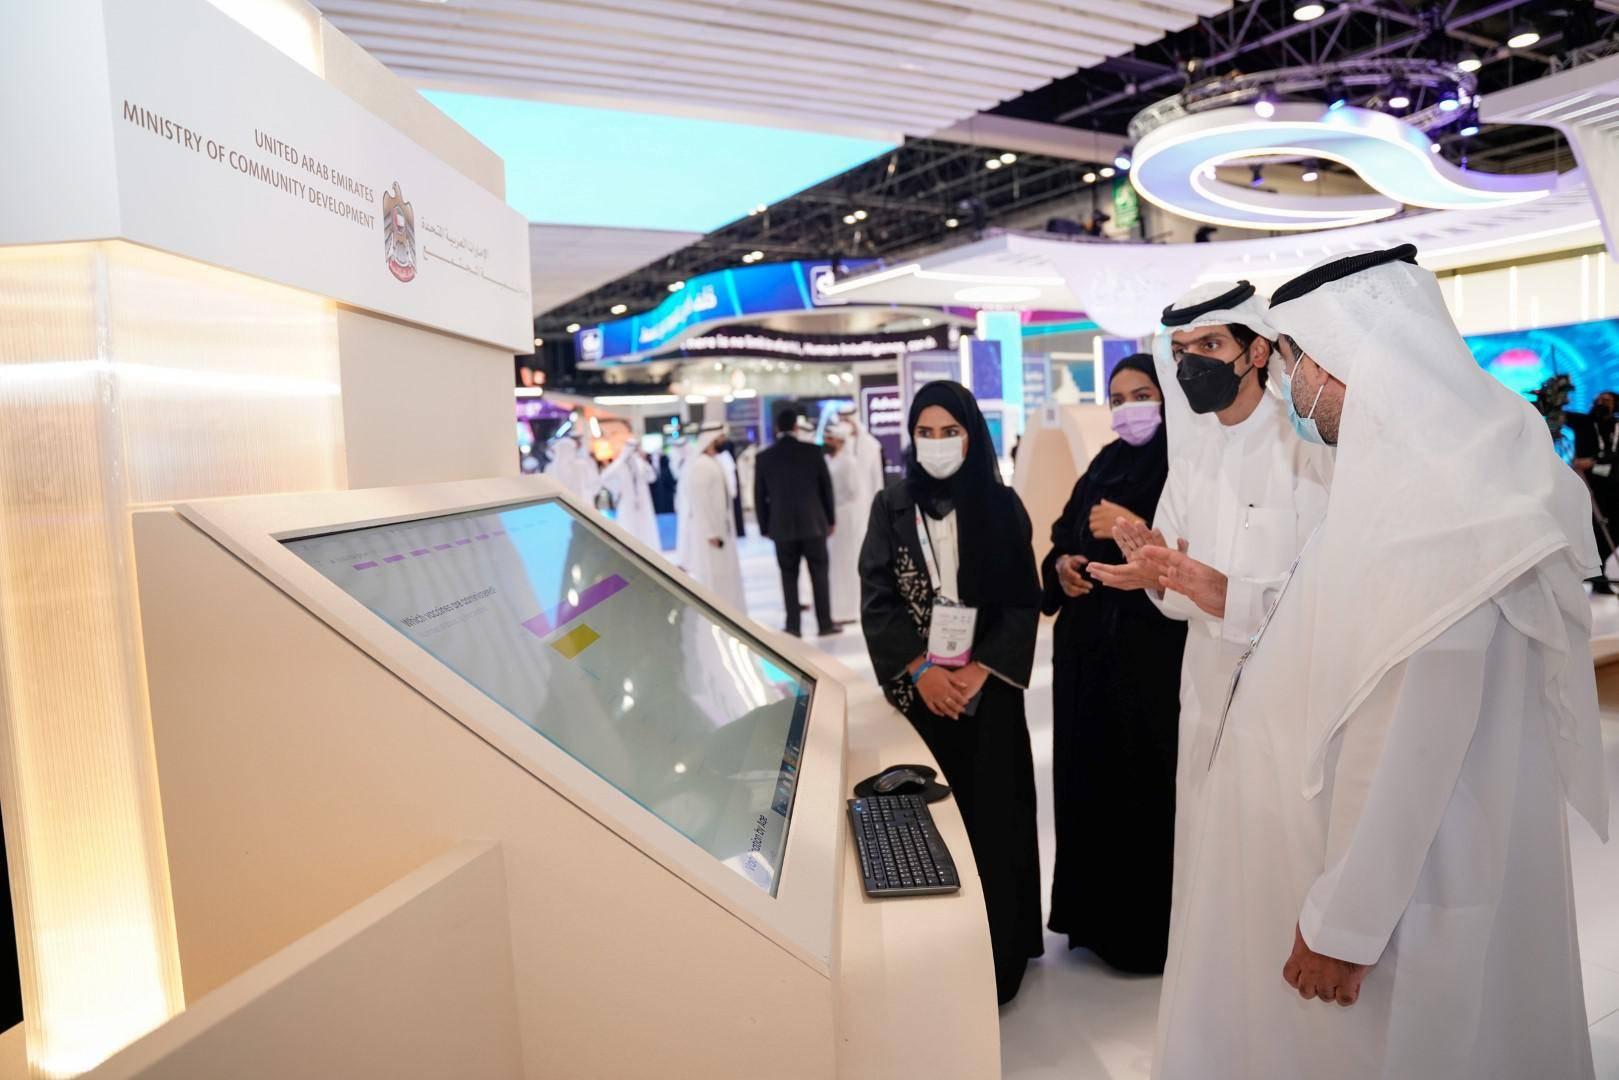 UAE: Now, apply for your Golden Visa at Gitex 2021